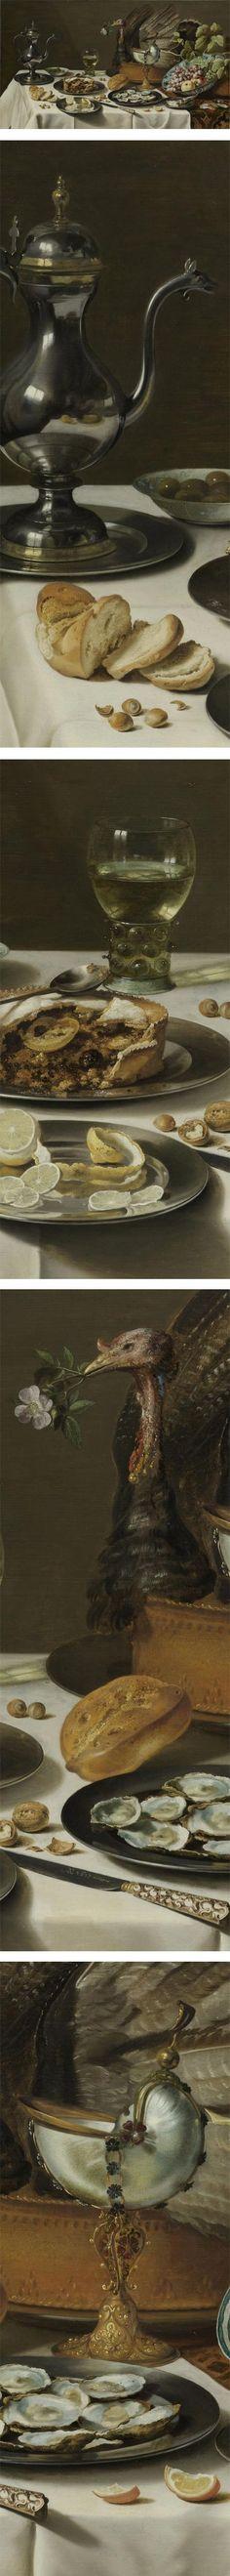 Still Life with a Turkey Pie, Pieter Claesz, 1627